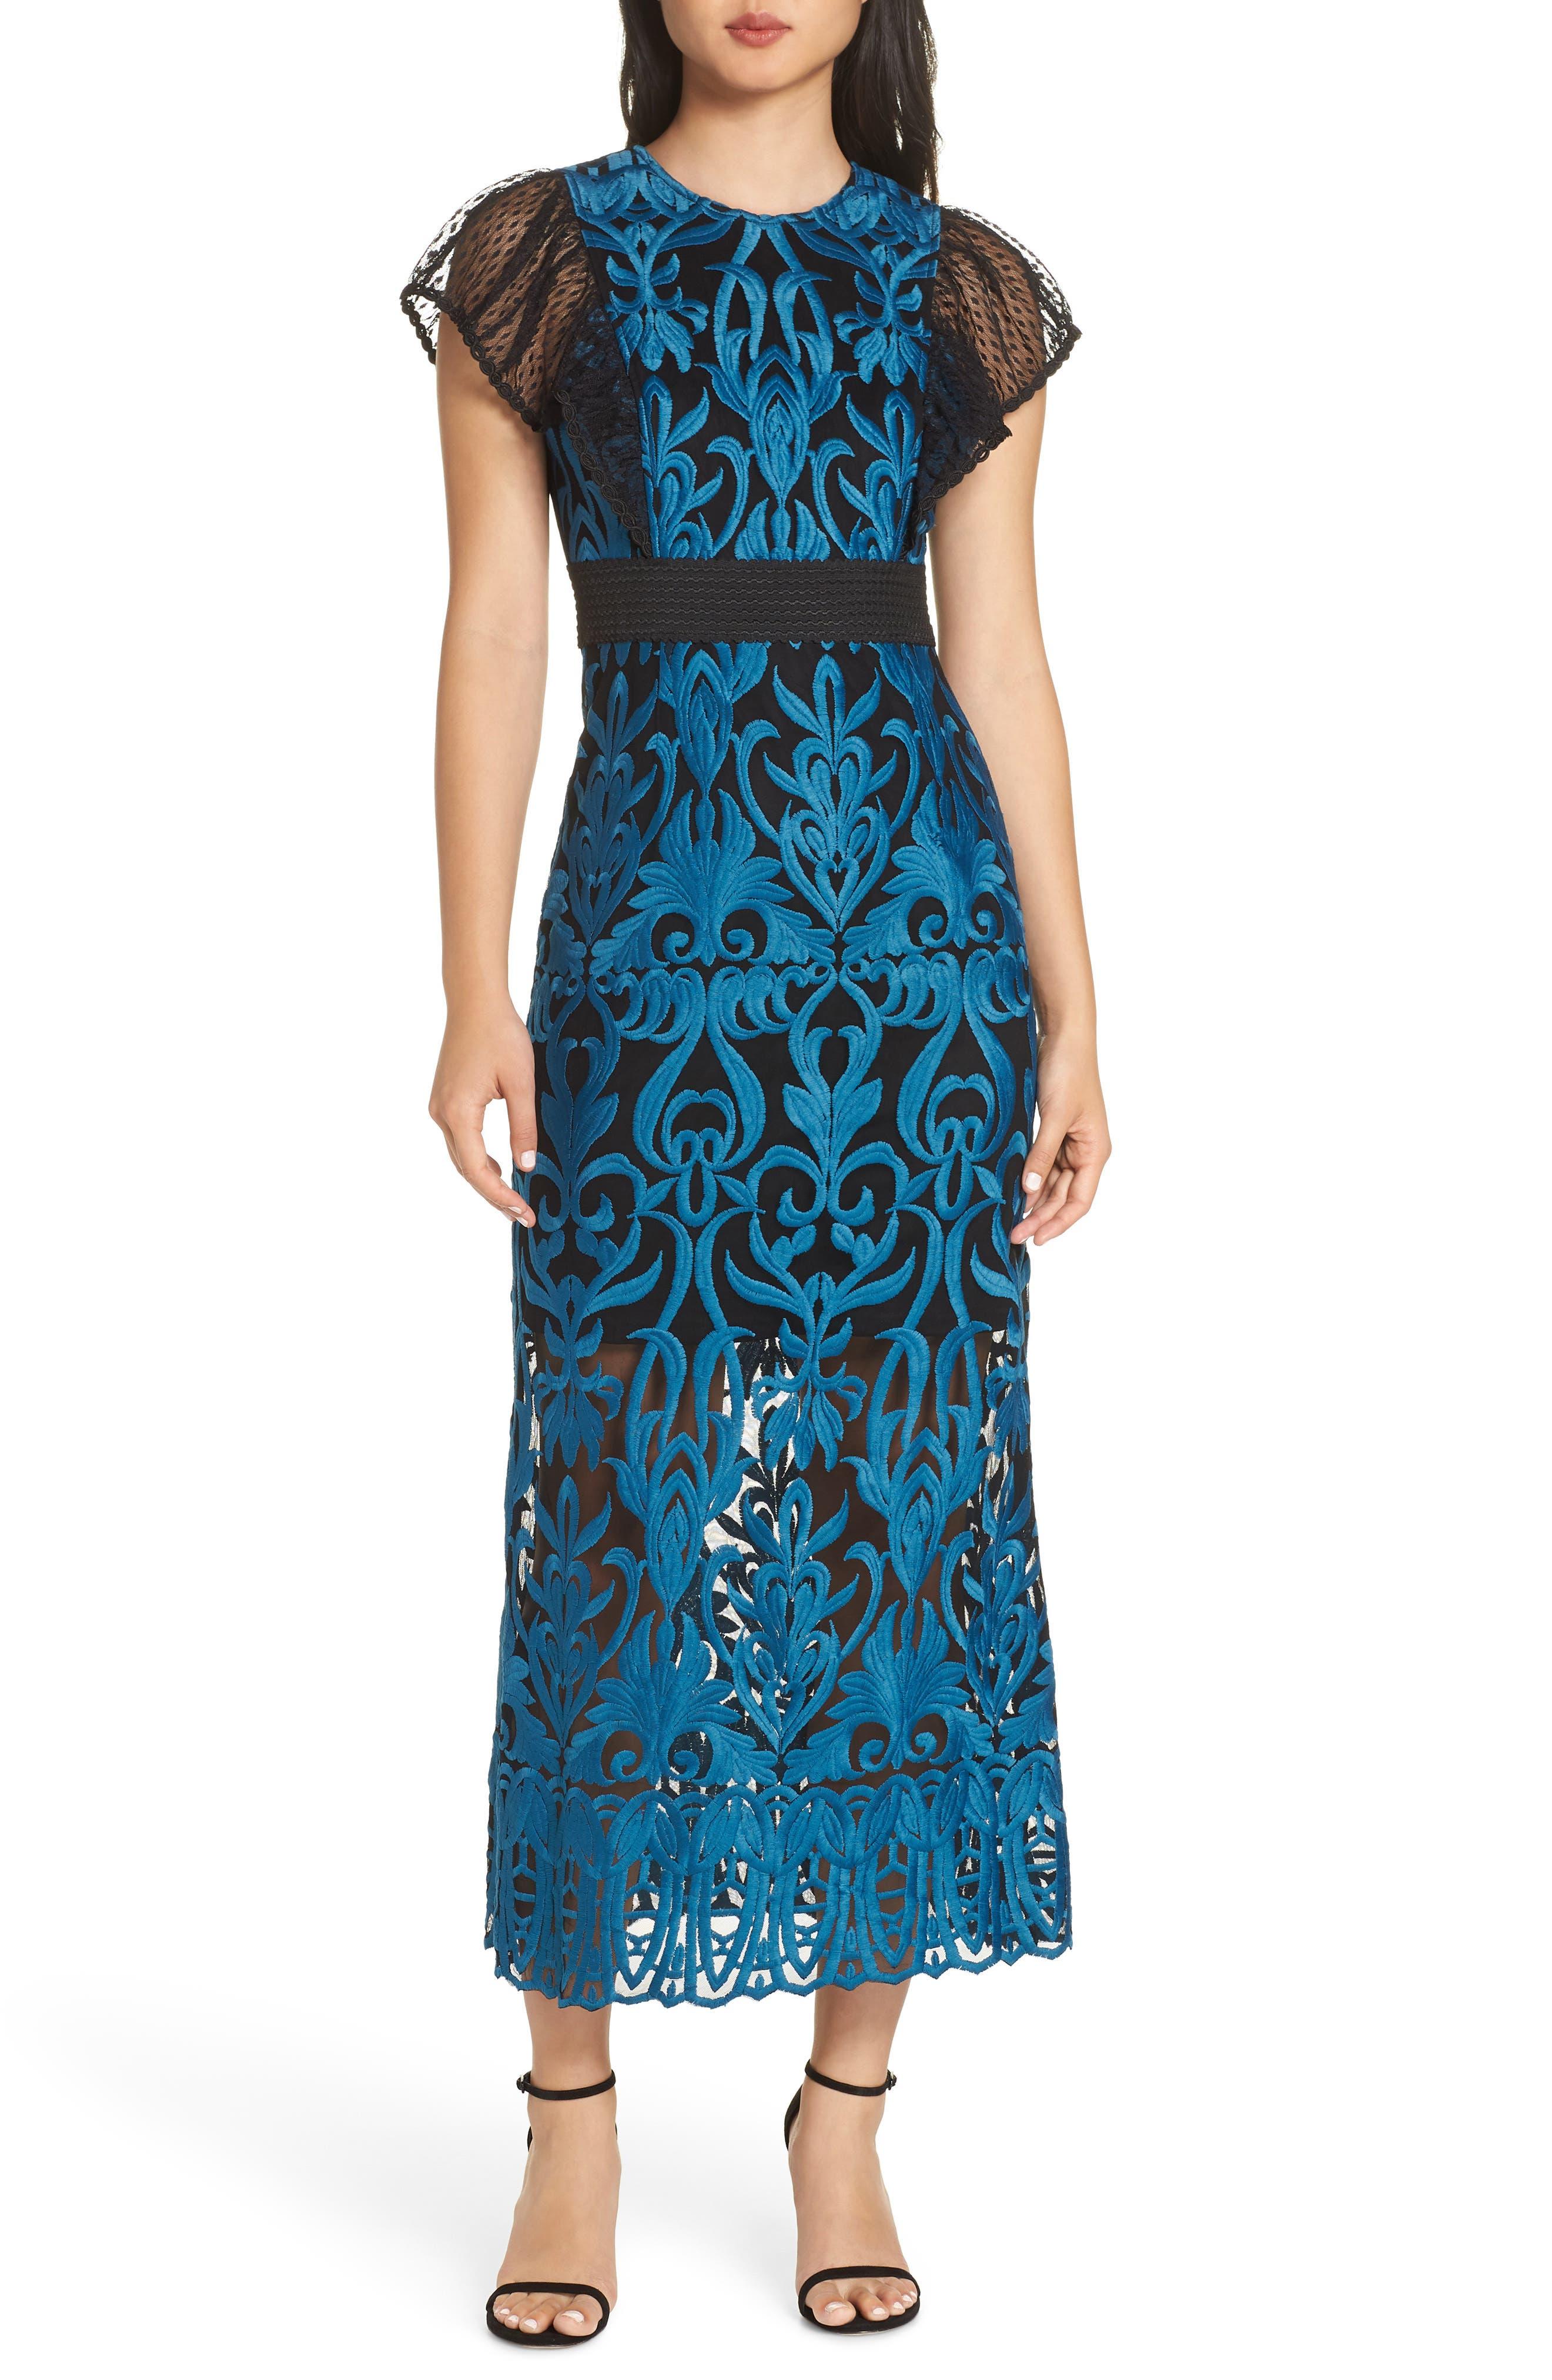 FOXIEDOX, Rosalynn Lace Midi Dress, Main thumbnail 1, color, 440